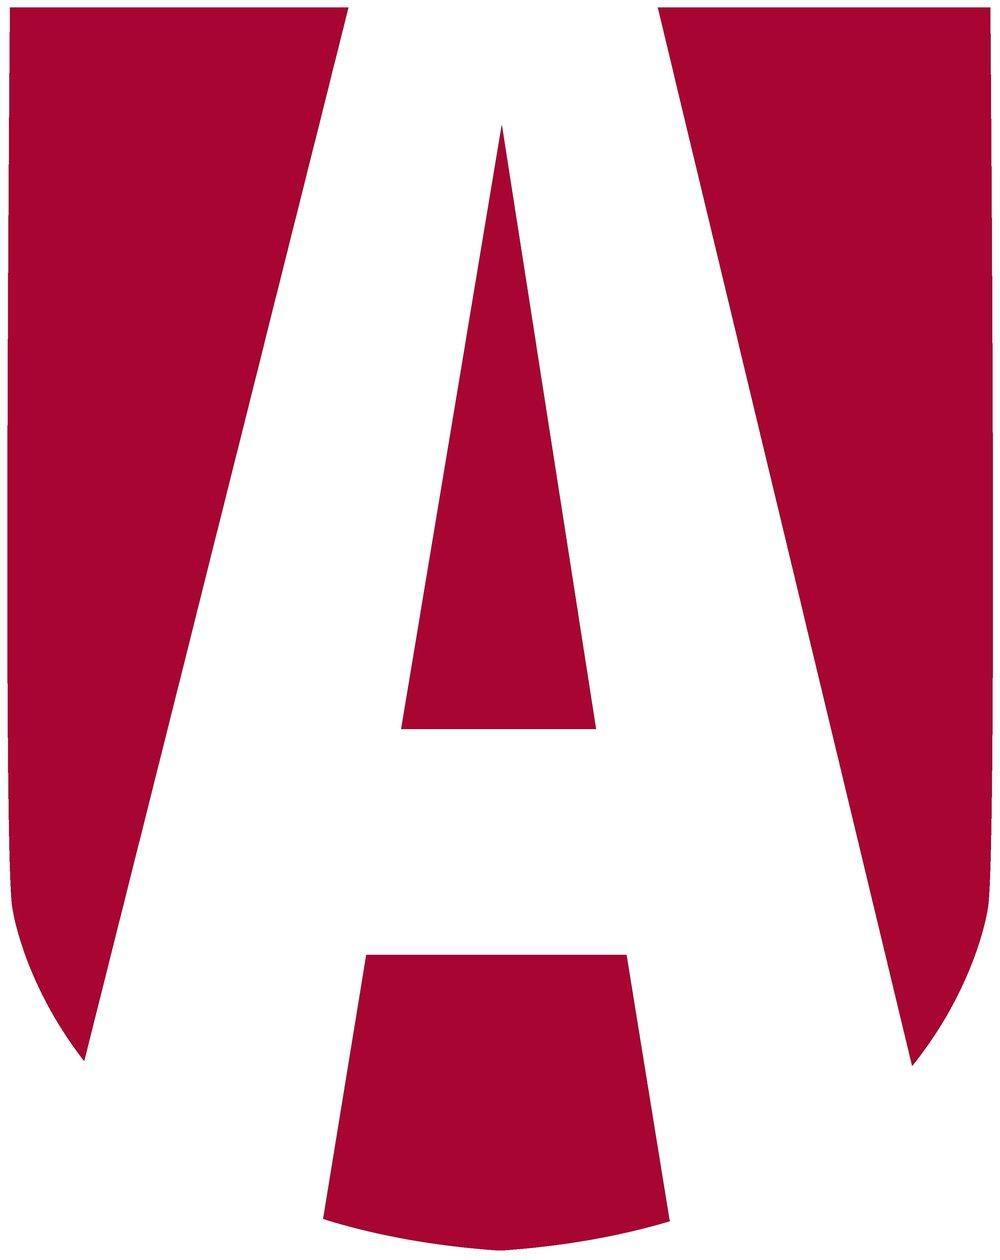 UA_Logo_Alone.jpg